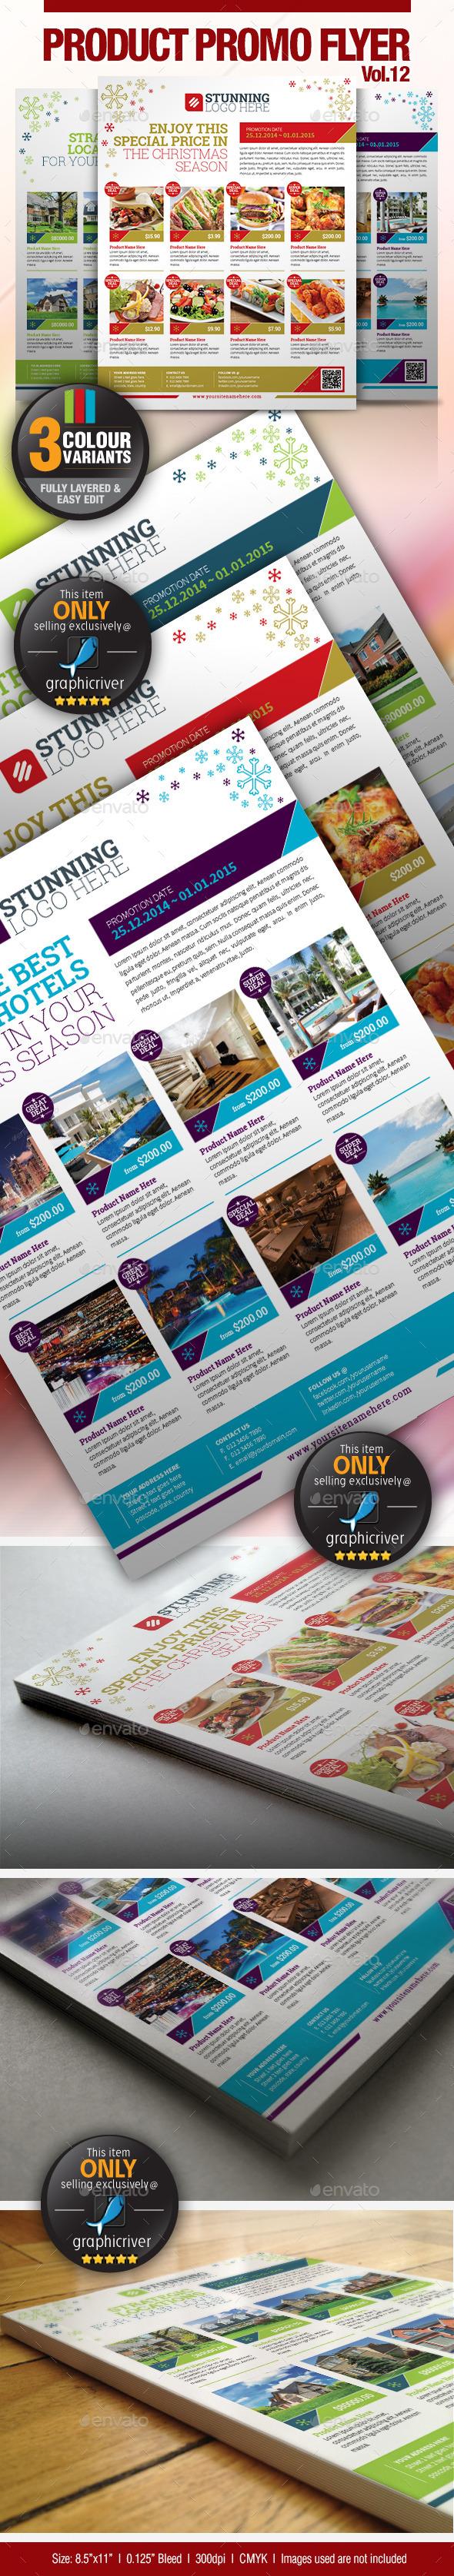 GraphicRiver Multi-Purpose Product Promotion Flyer Vol.11 9533125